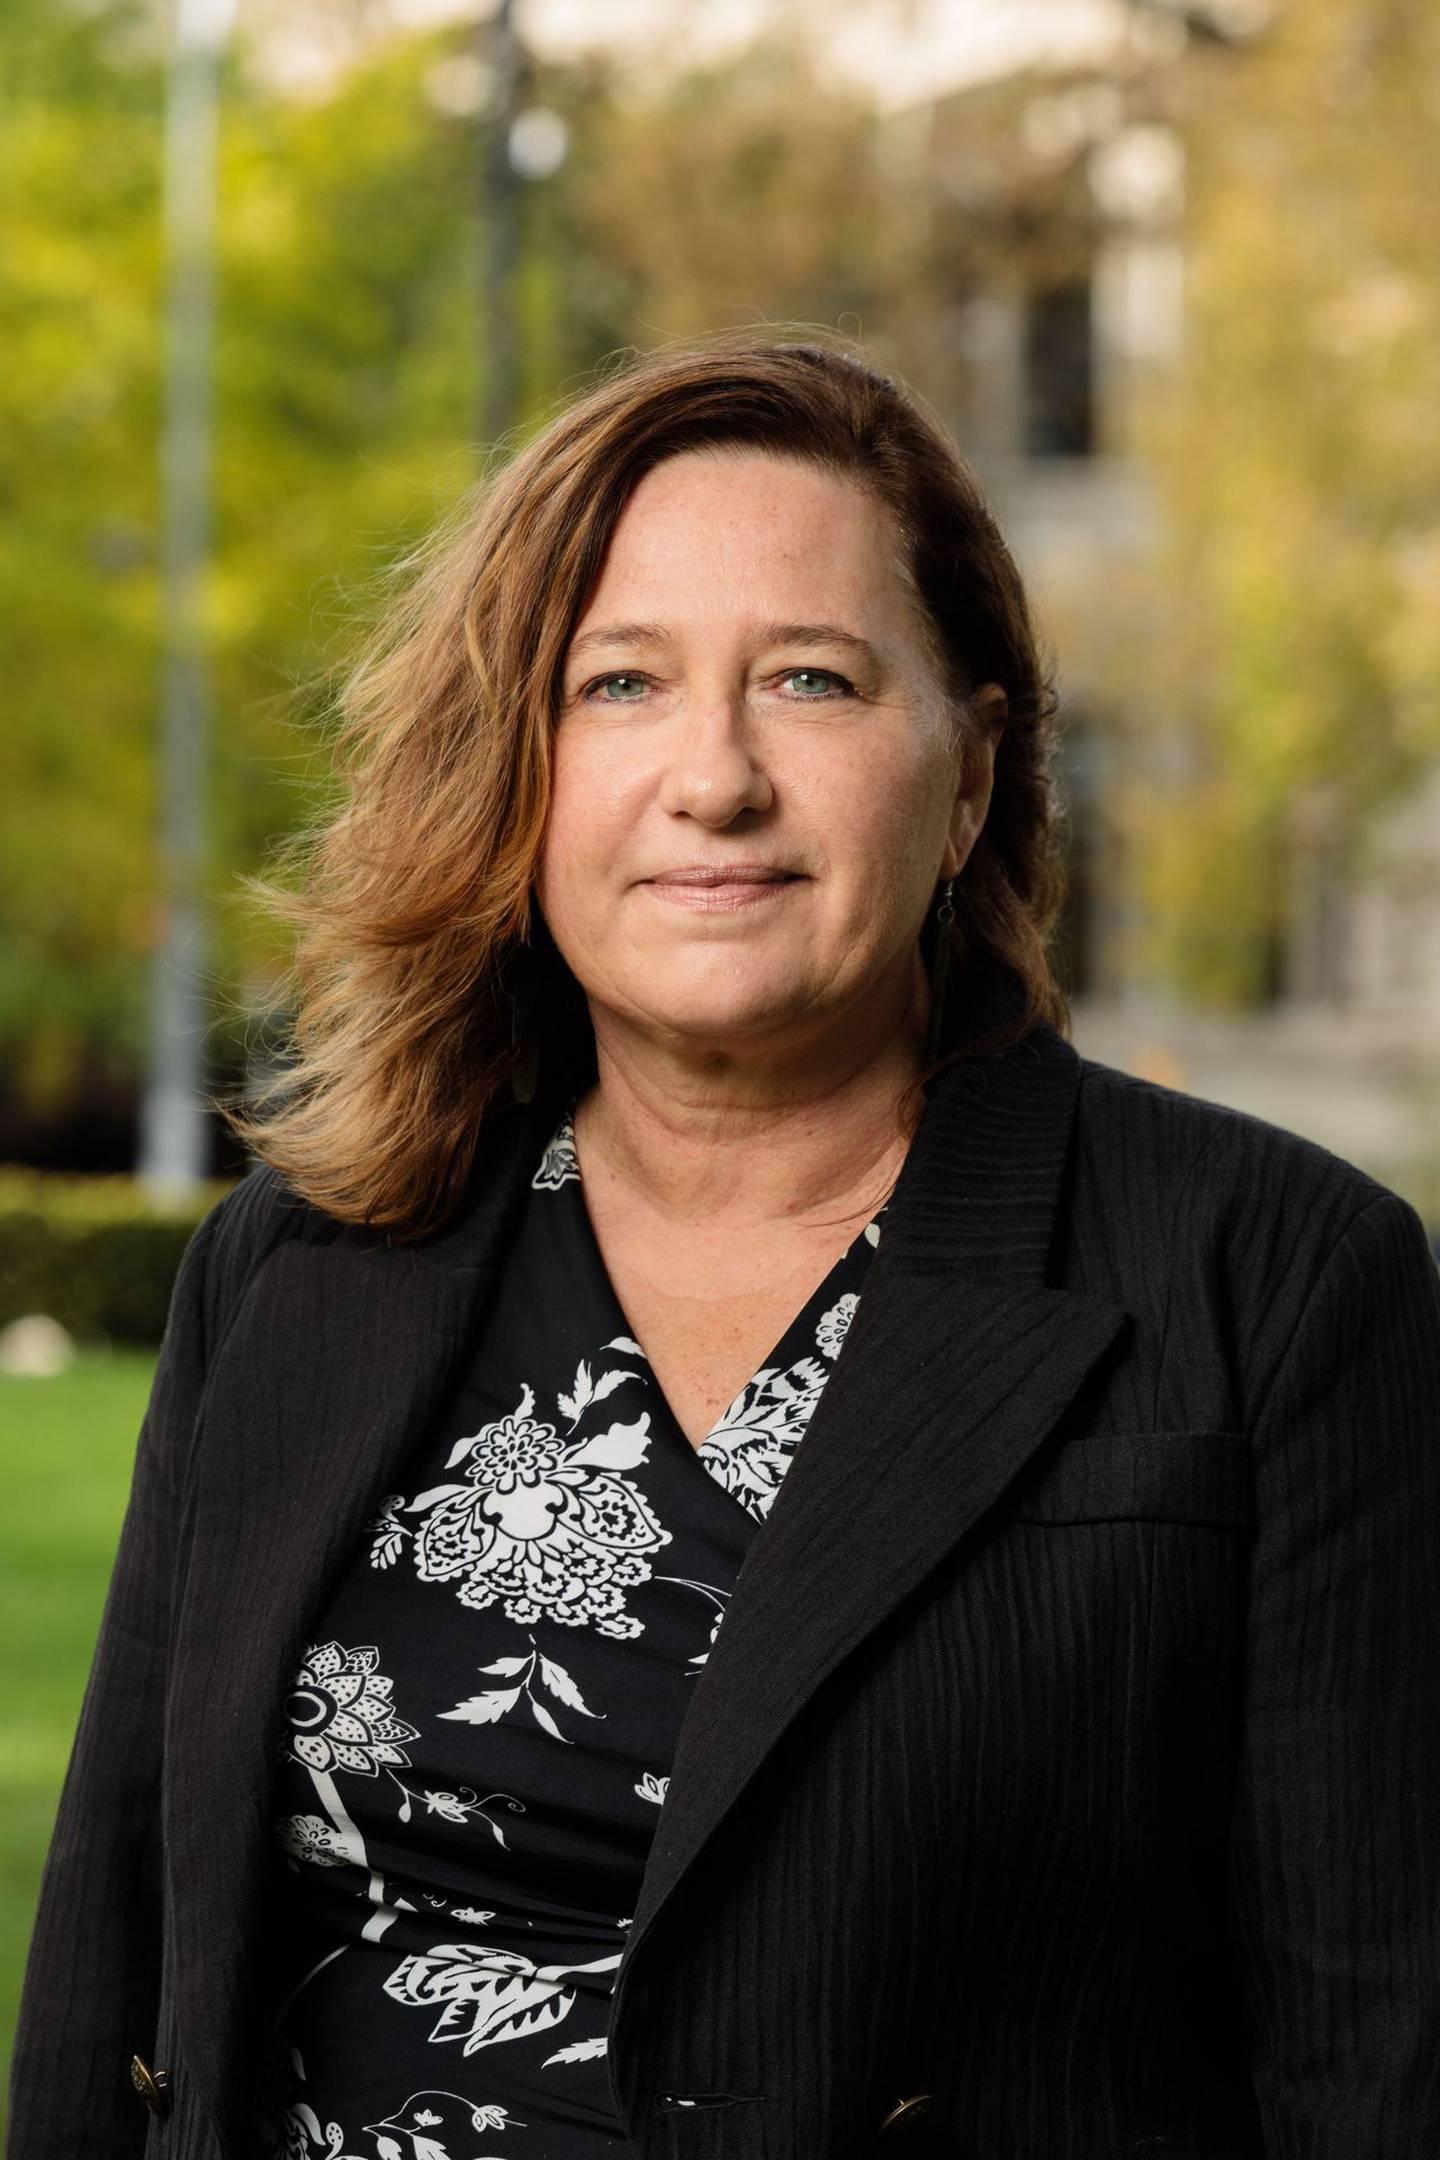 University of Auckland vaccinologist professor Associate Professor Helen Petousis-Harris. Photo / Supplied